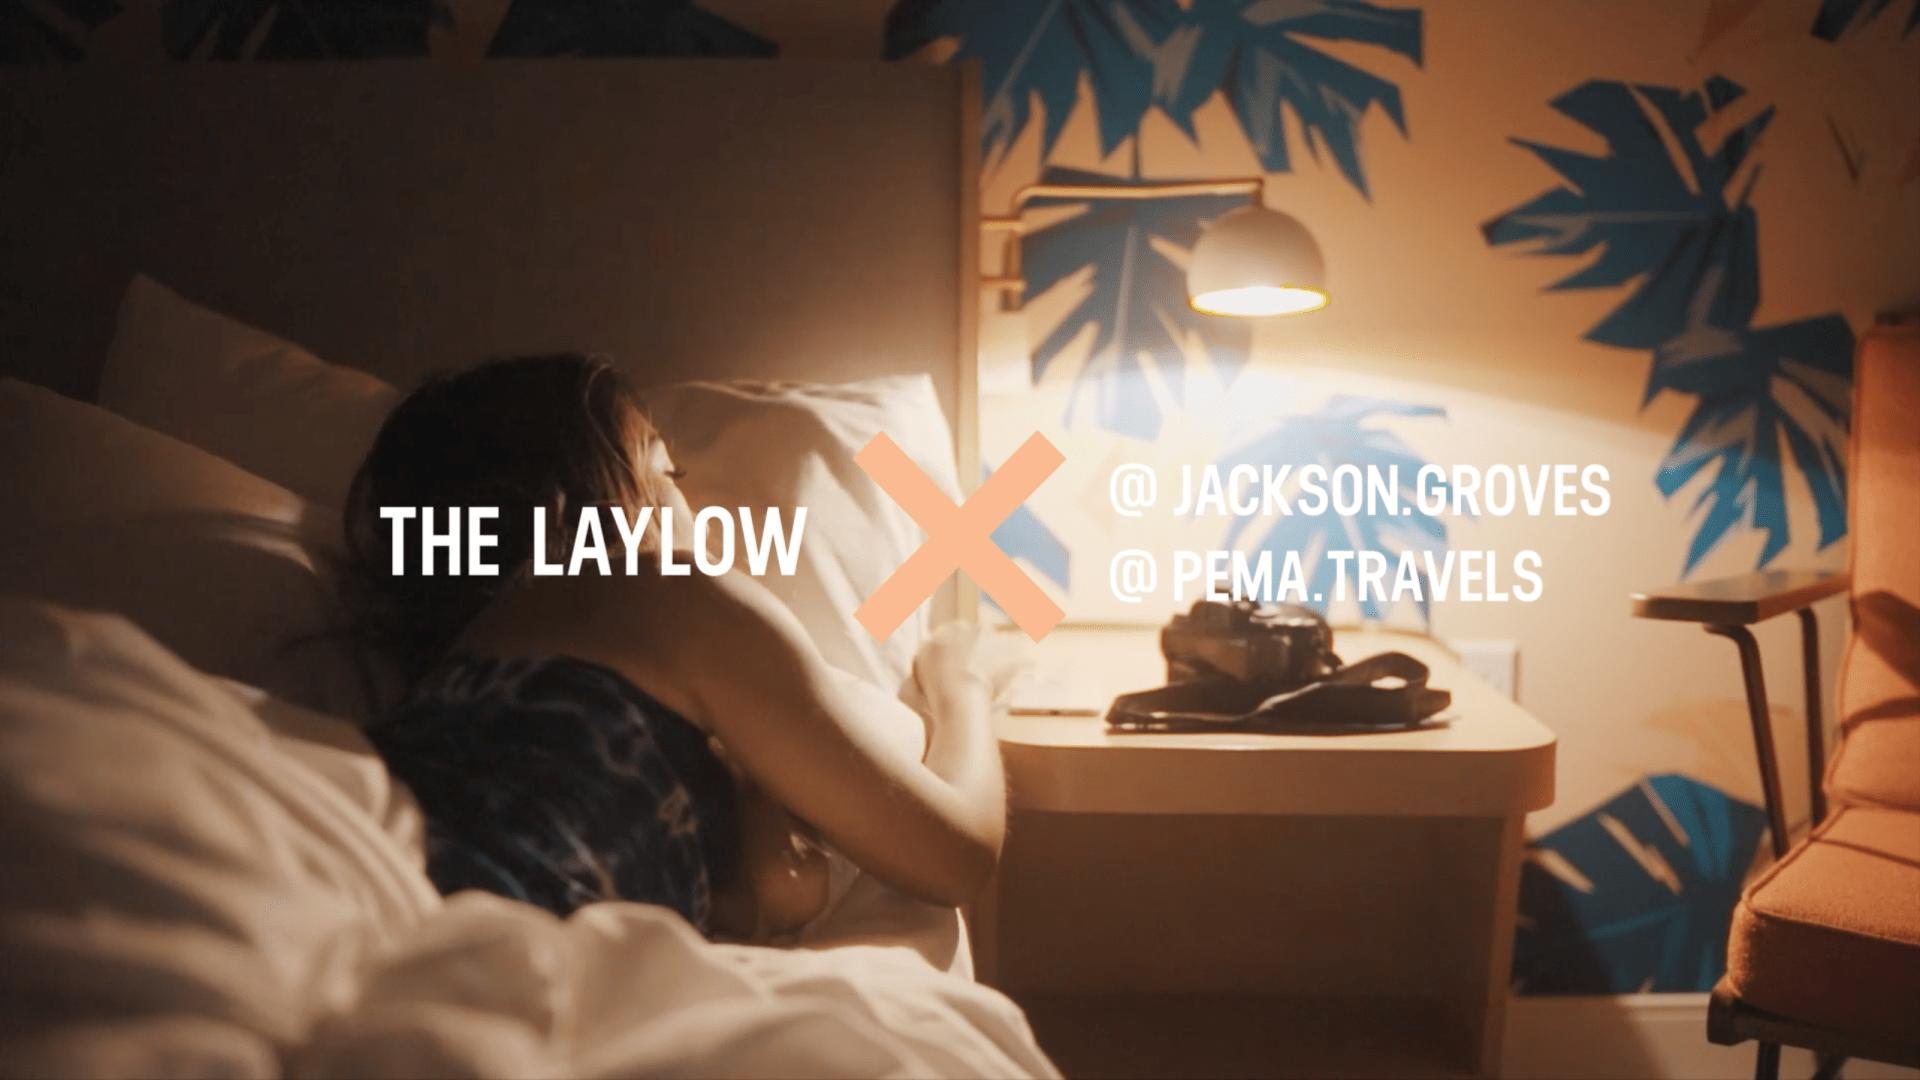 The Laylow x Jackson & Pema